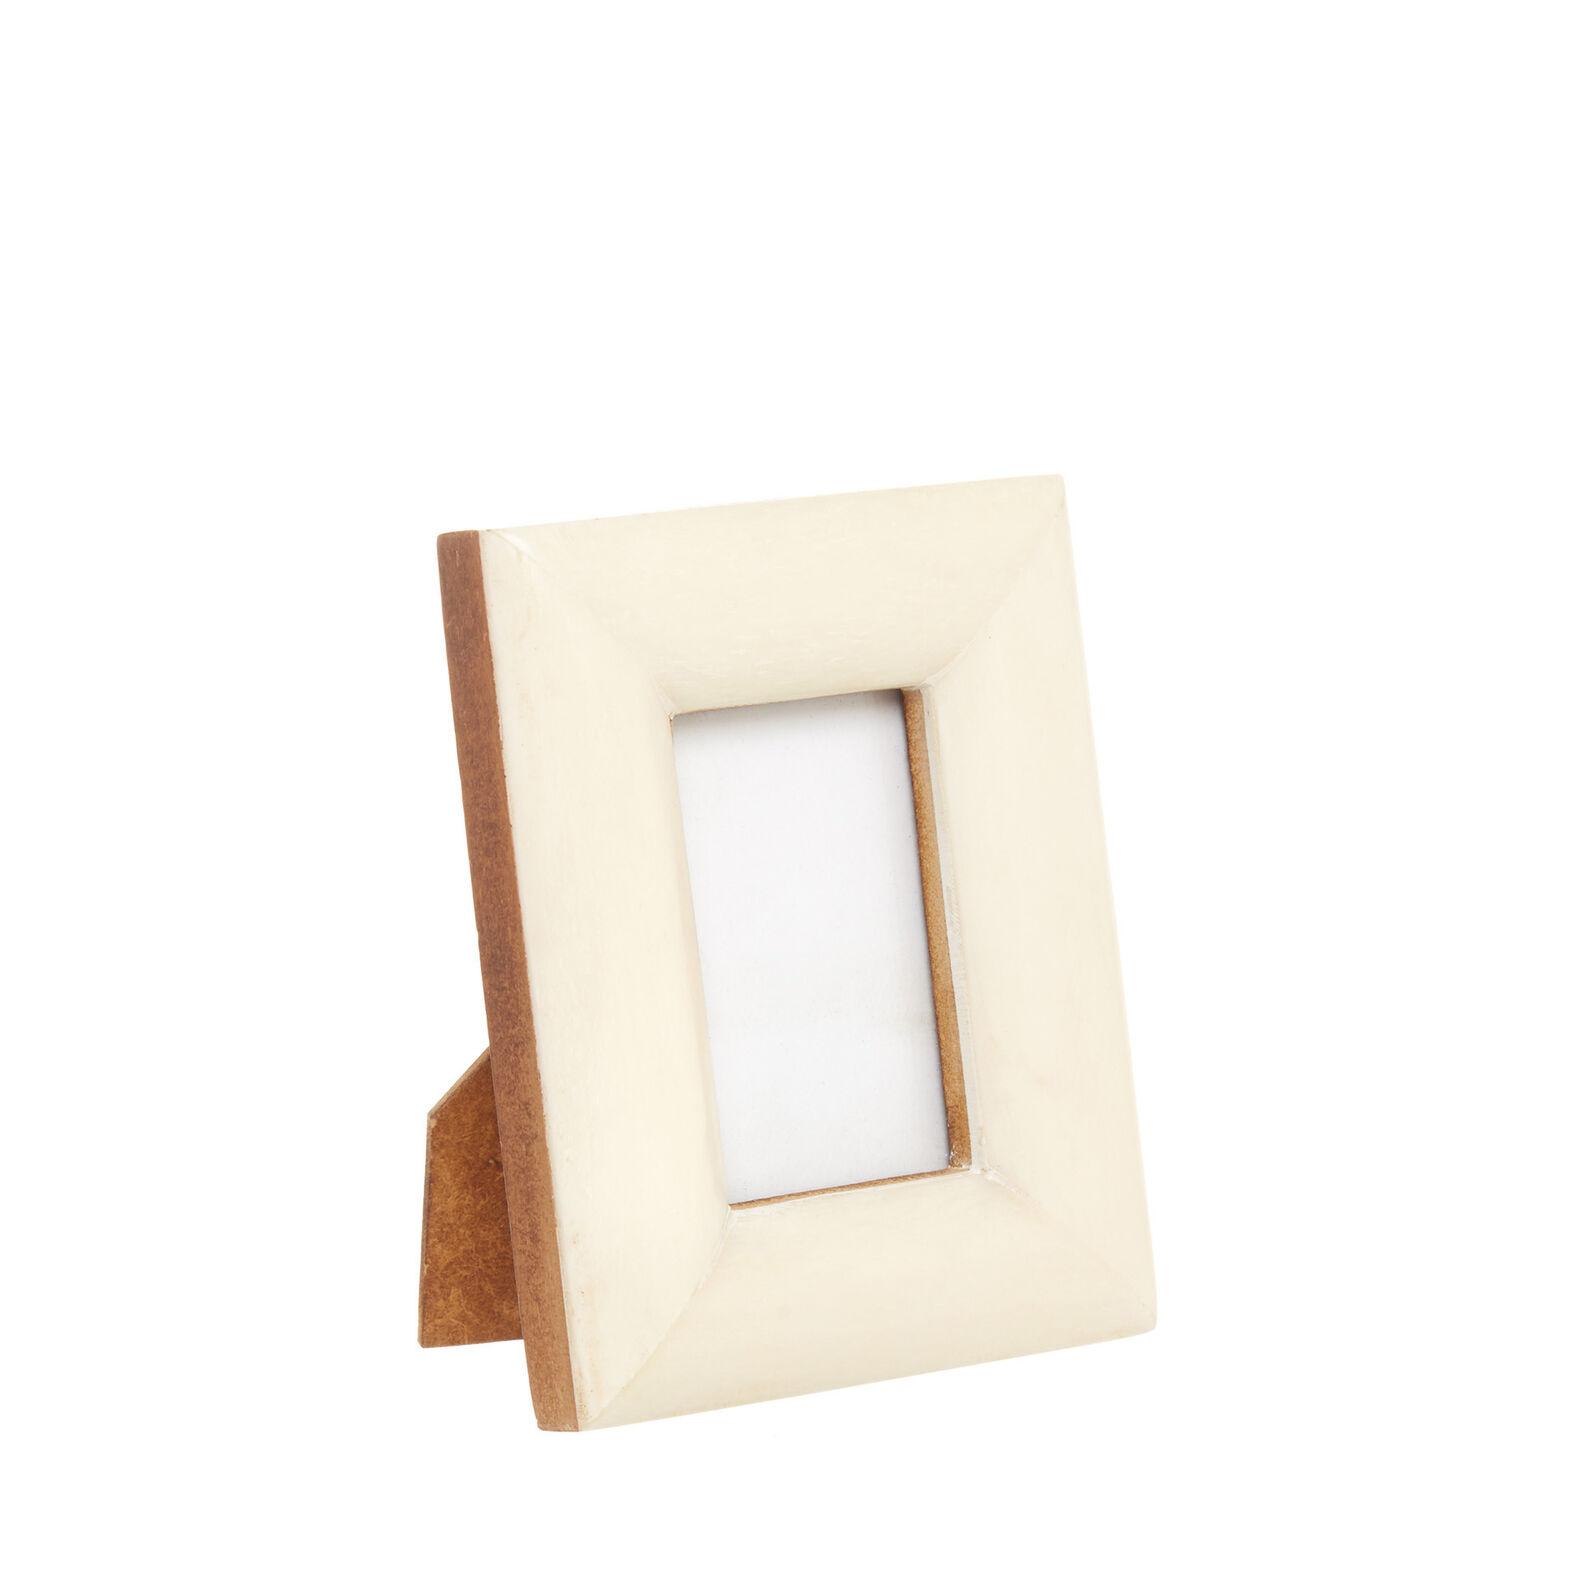 Hand made bone photo frame